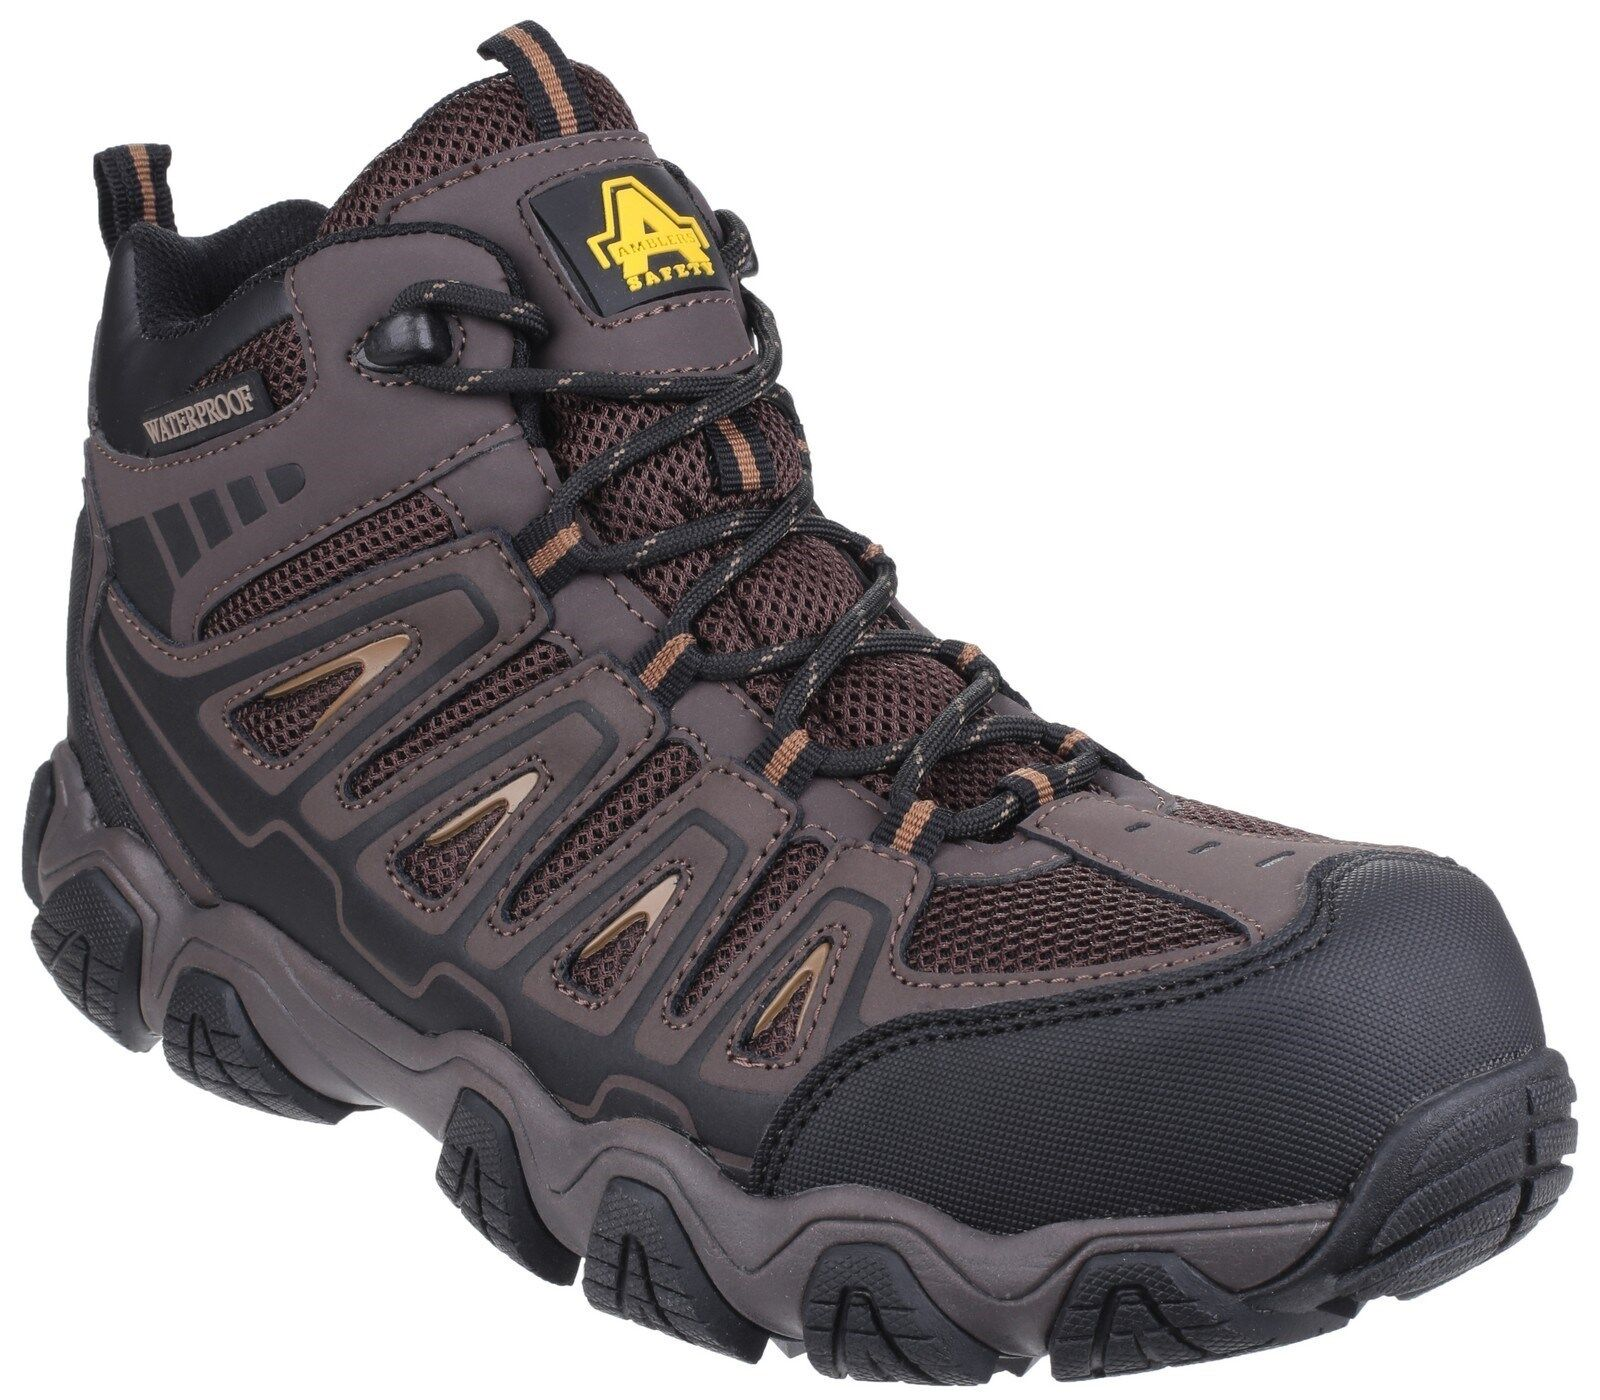 Amblers AS801 Rockingham Hombre Marrón botas Leather Waterproof Safety Hikier botas Marrón 631bba